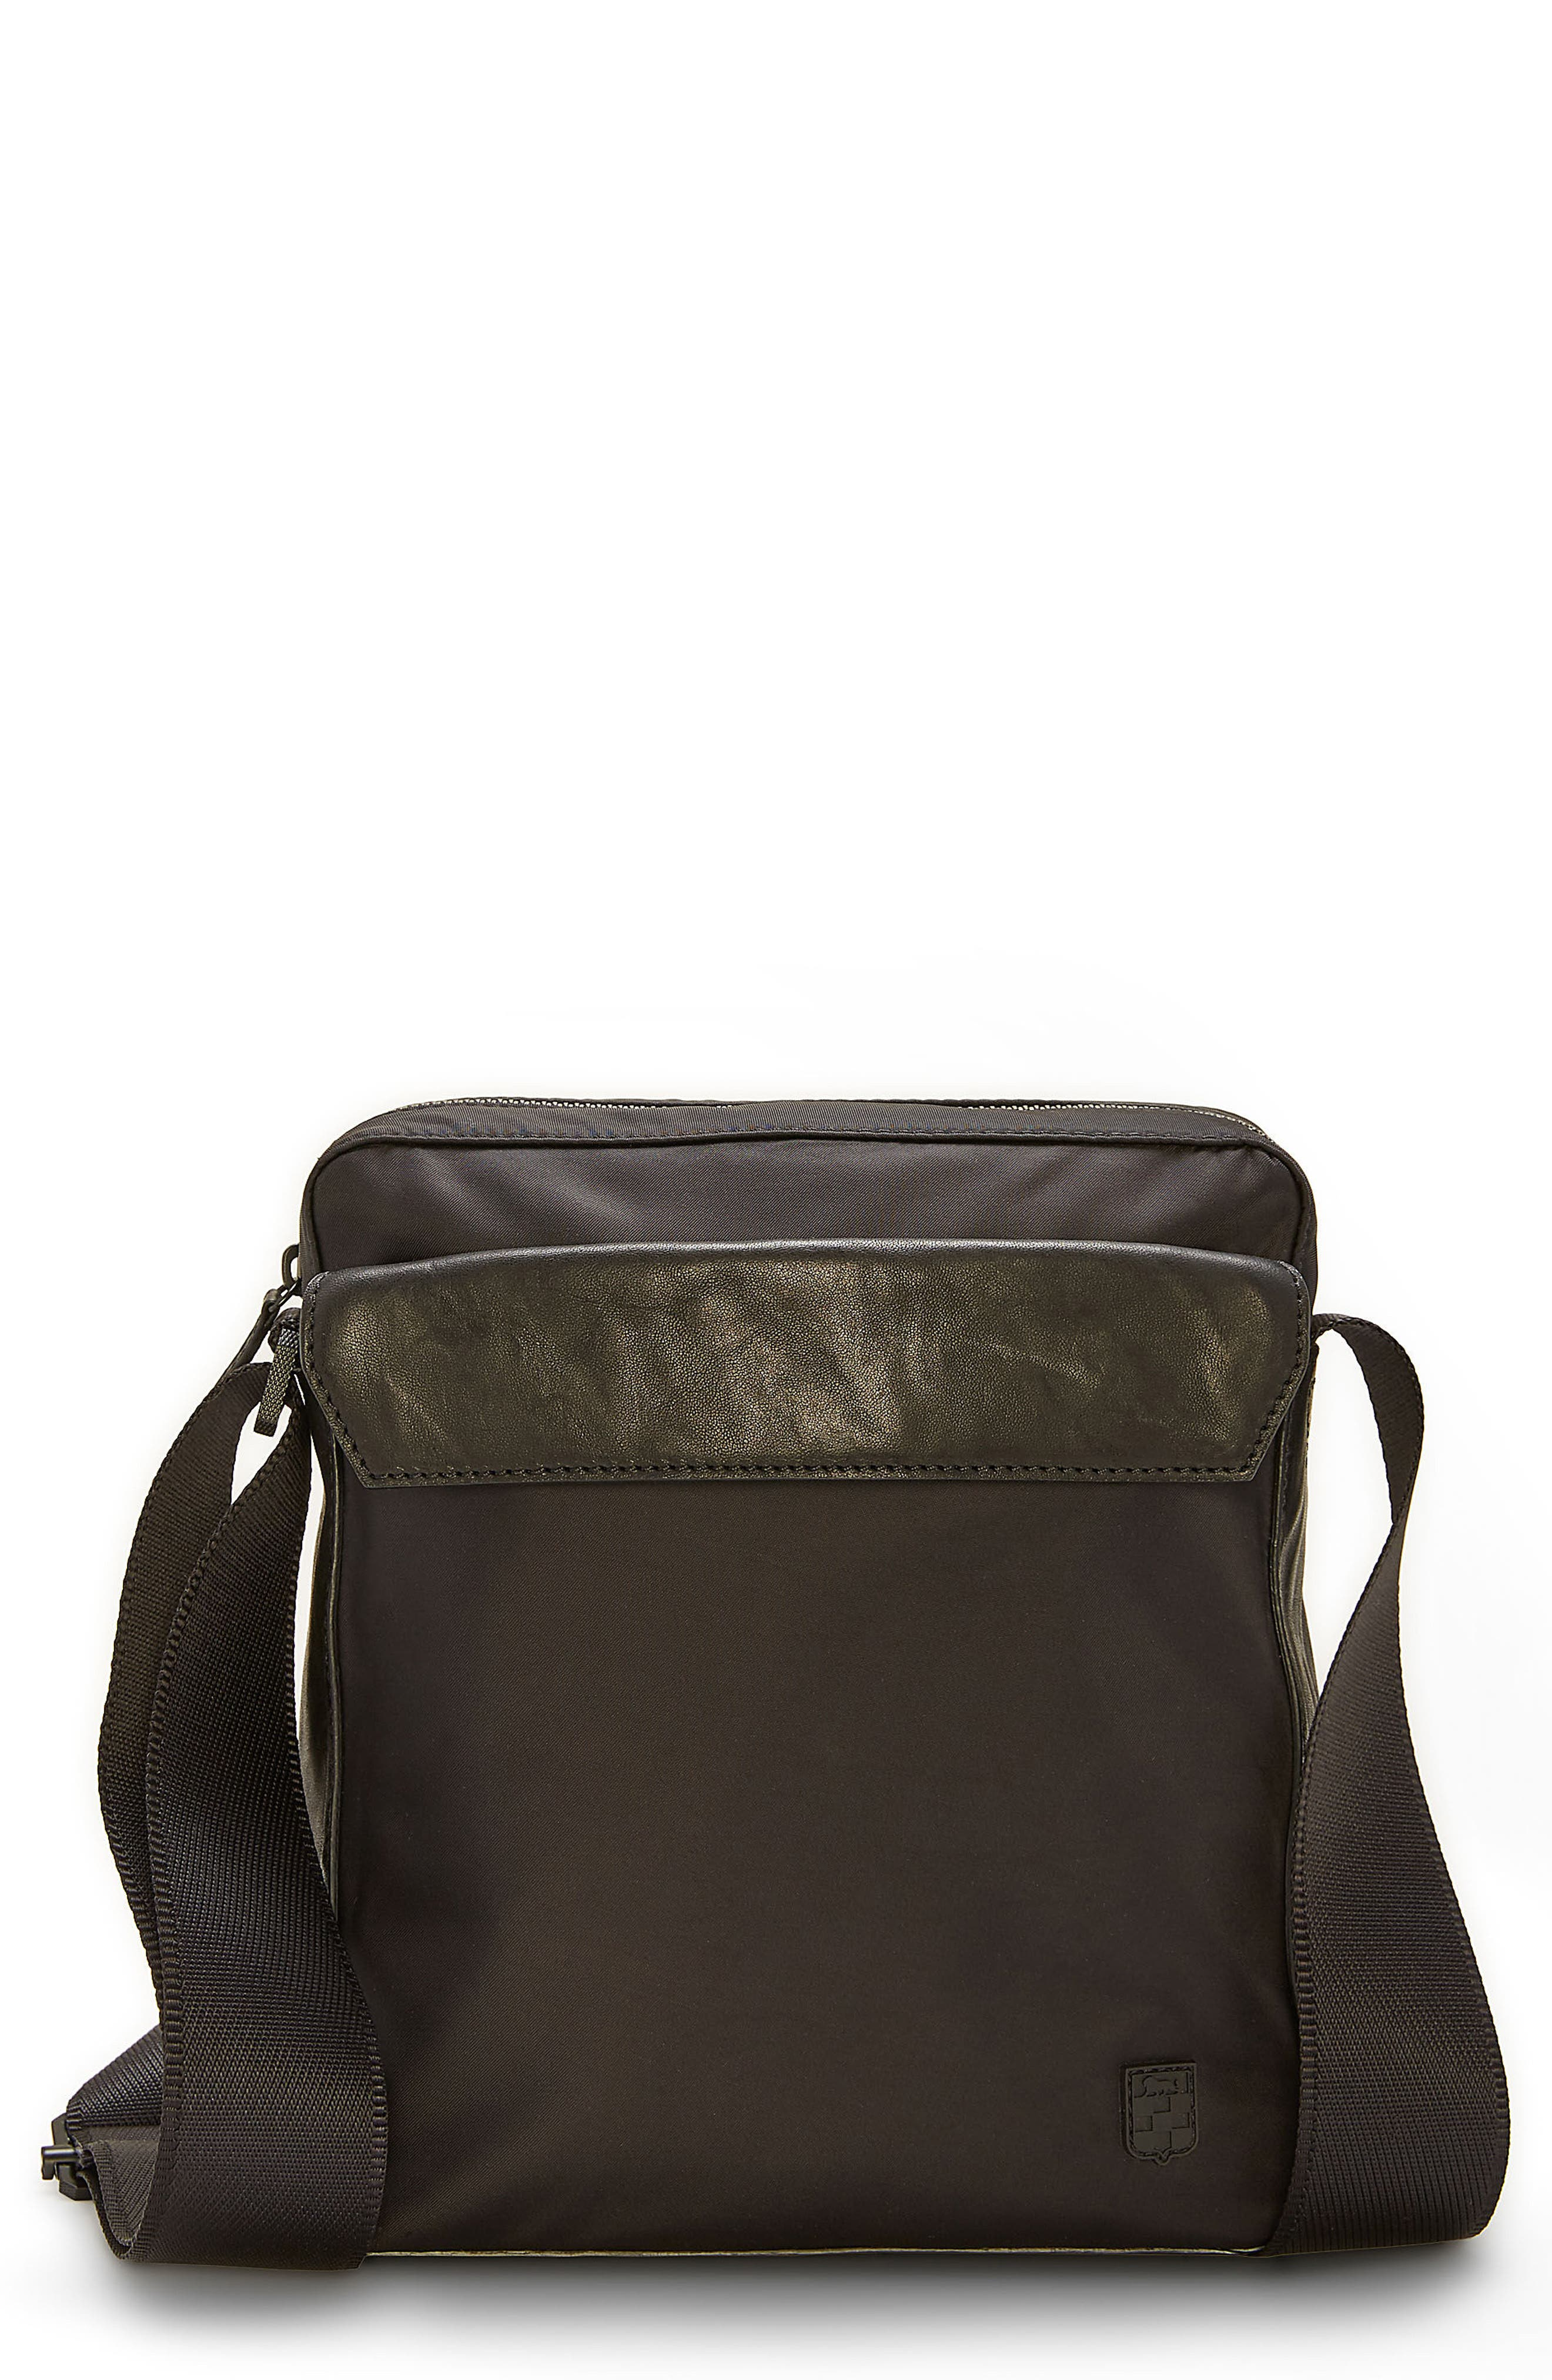 Basin Crossbody Bag,                             Main thumbnail 1, color,                             Black